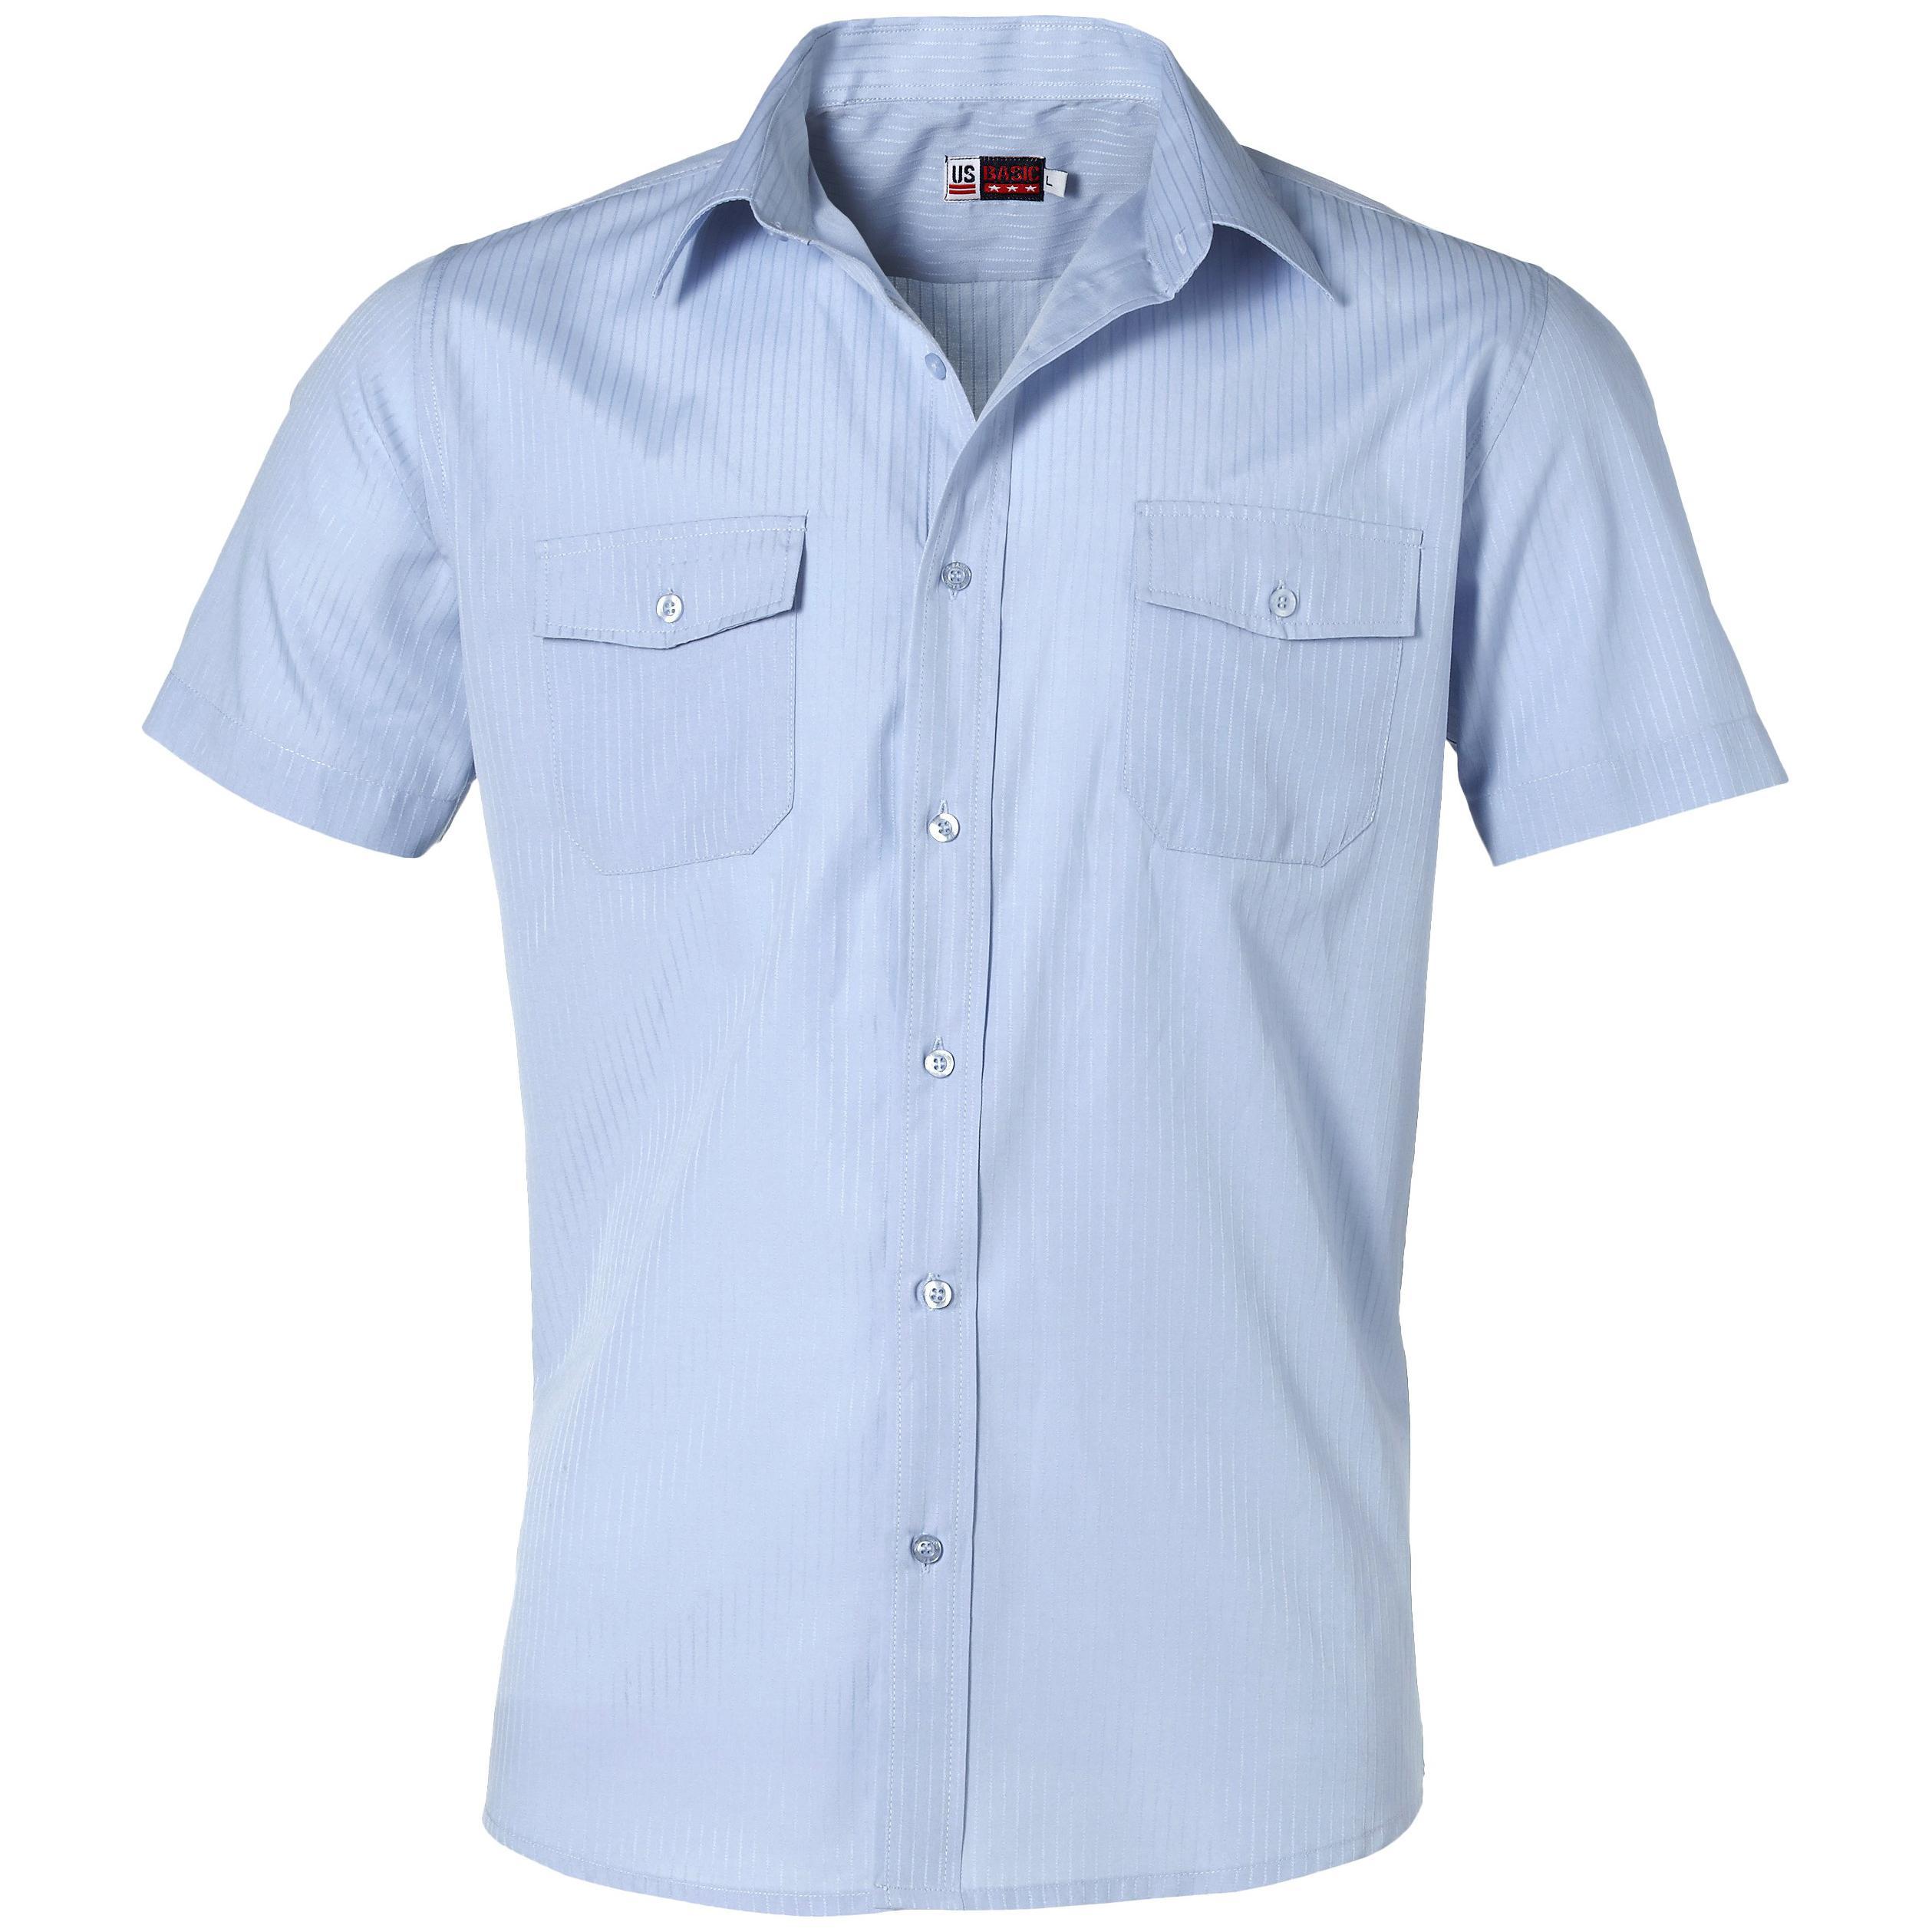 Mens Short Sleeve Bayport Shirt - Light Blue Only